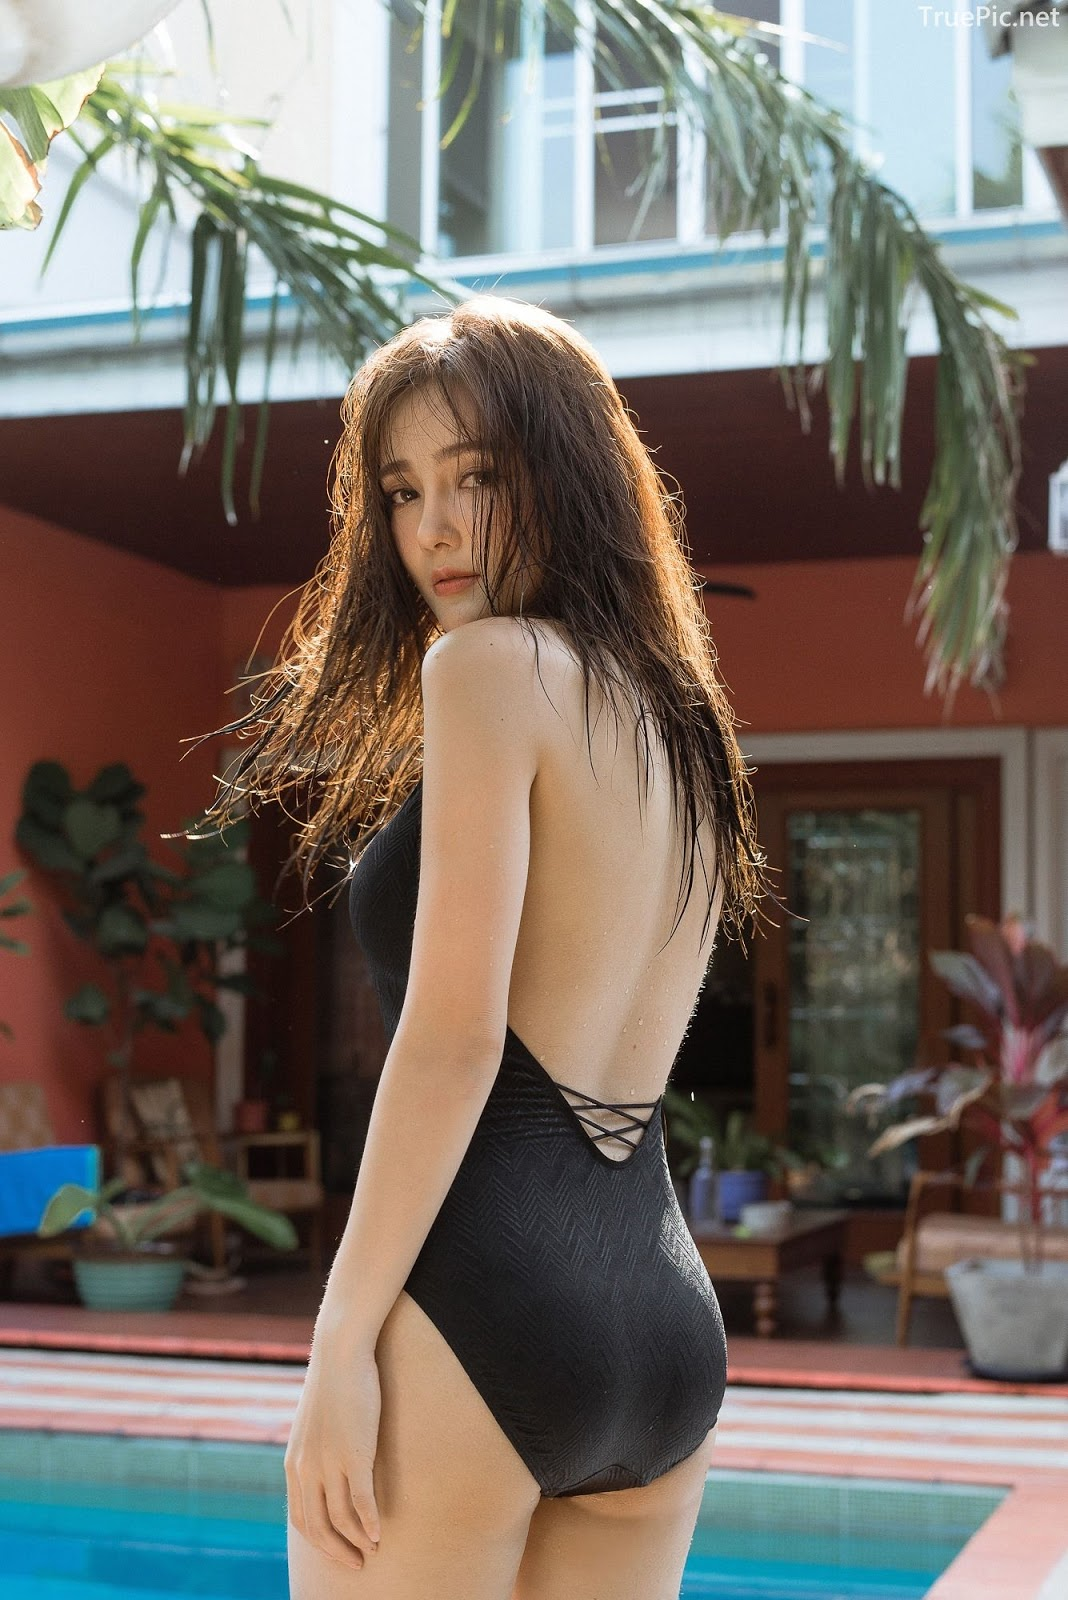 Thailand hot model Rossarin Klinhom - Photo album Summer Vibe - TruePic.net- Picture 6